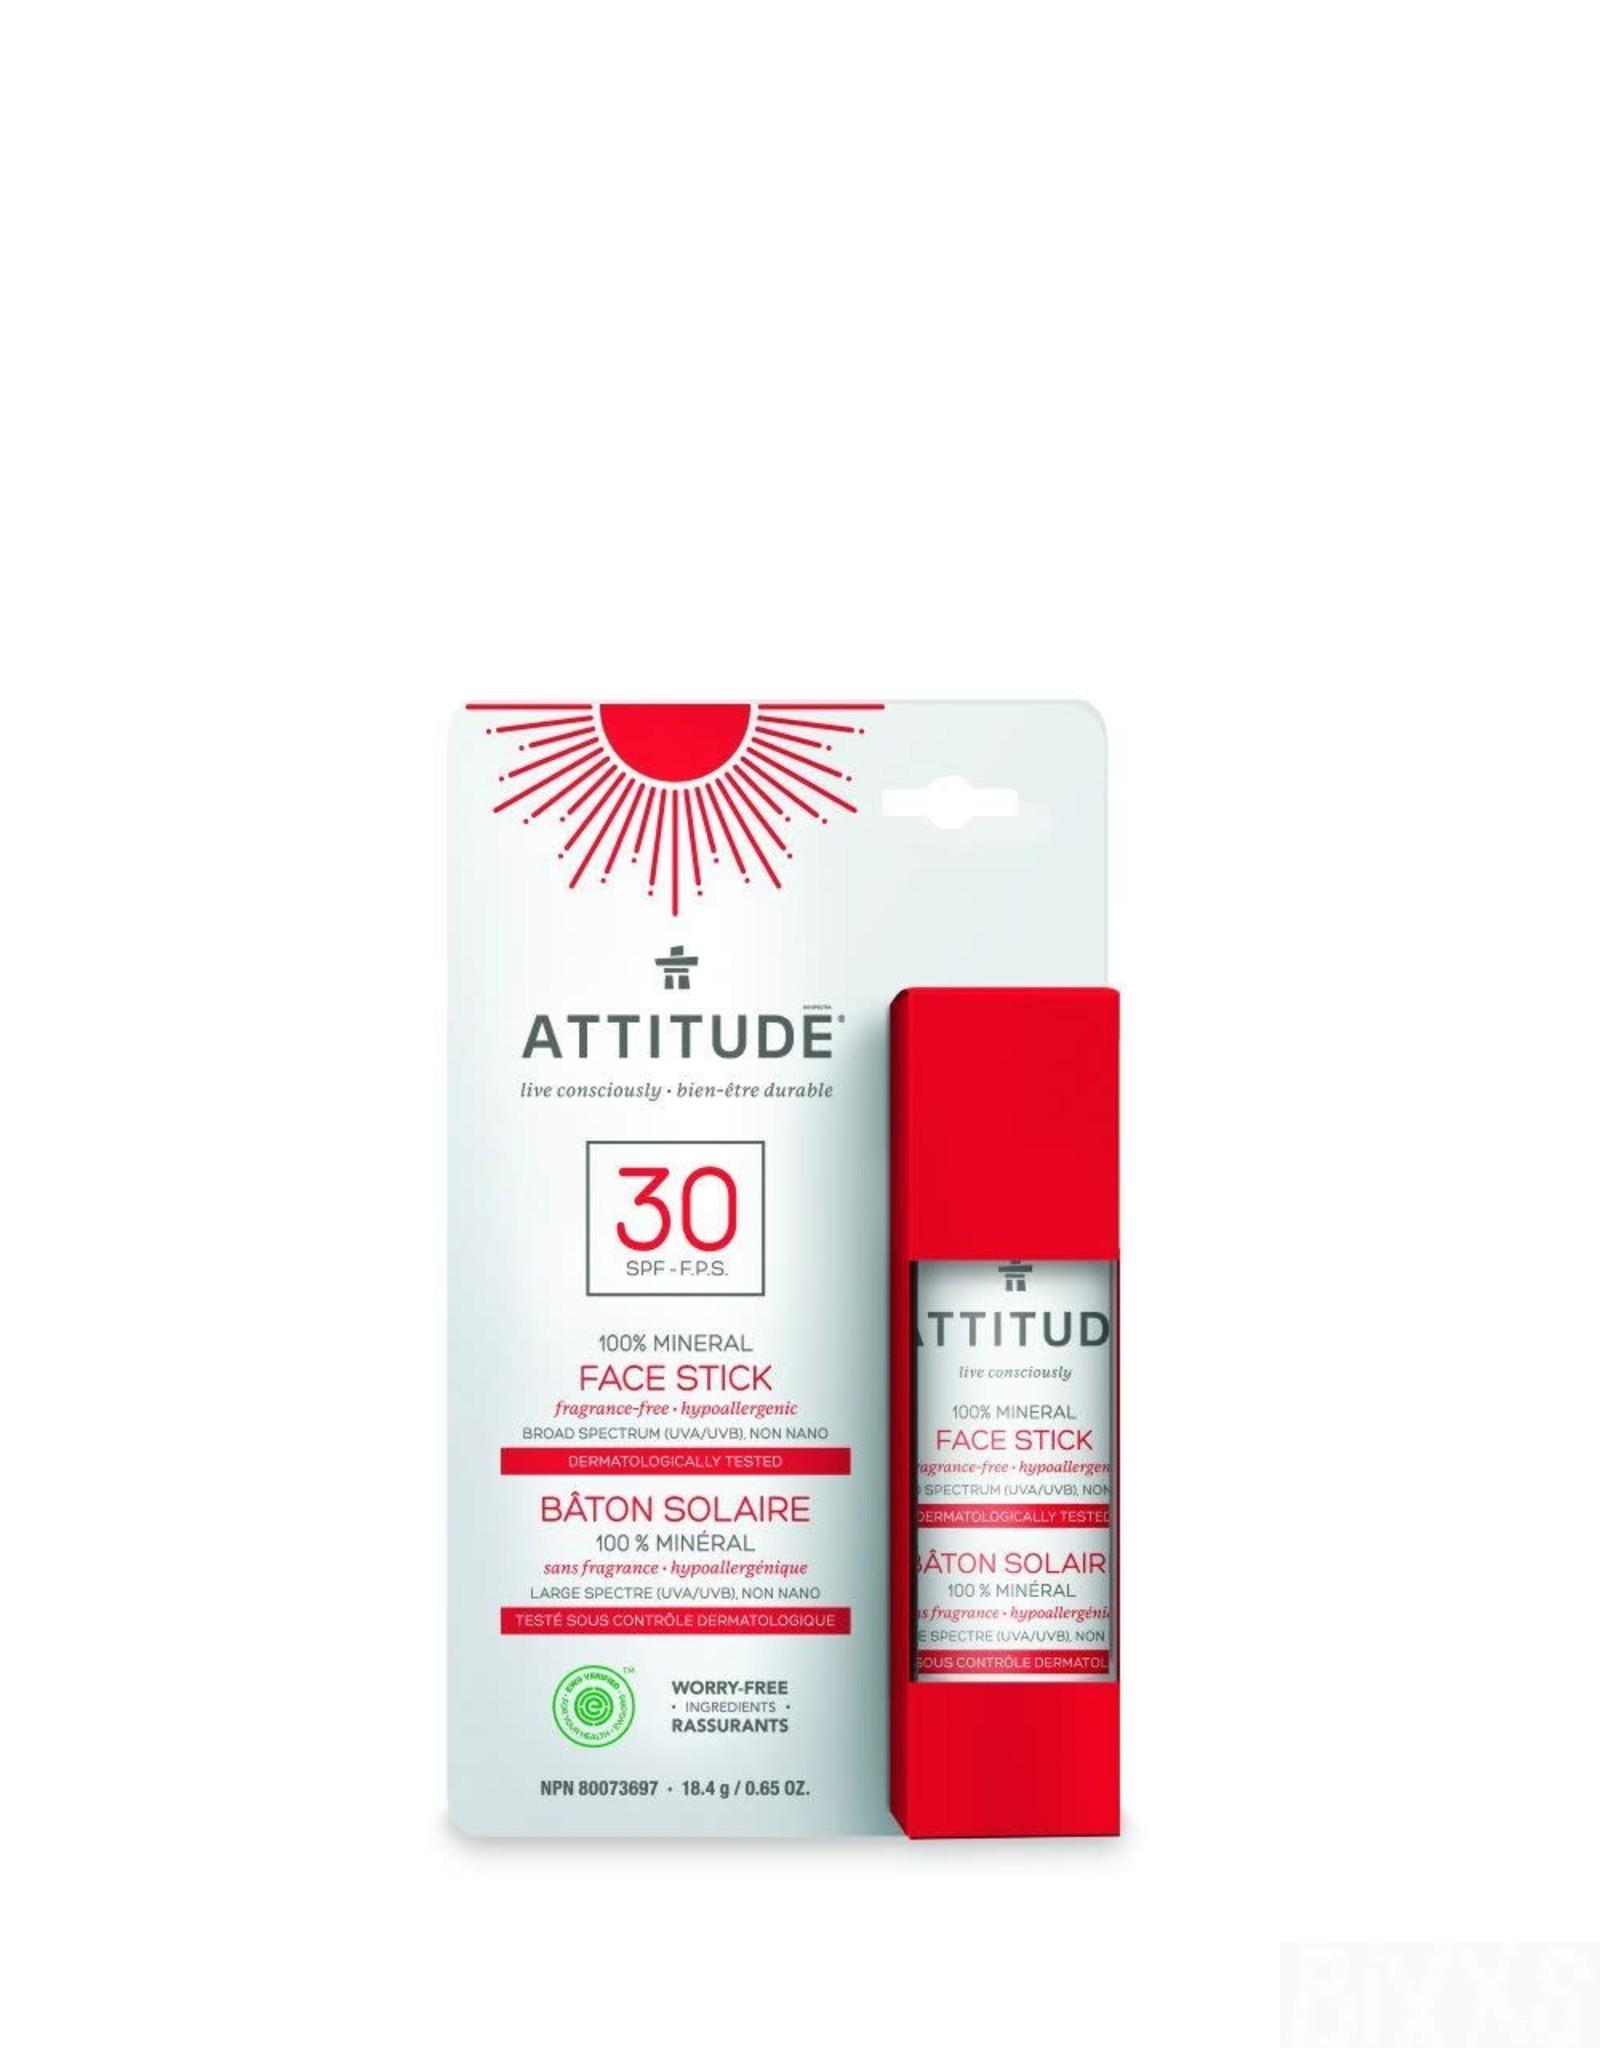 Attitude Zonnebrandcreme - Gezichts- en Lipstick SPF30 - fragrance free 18.4g